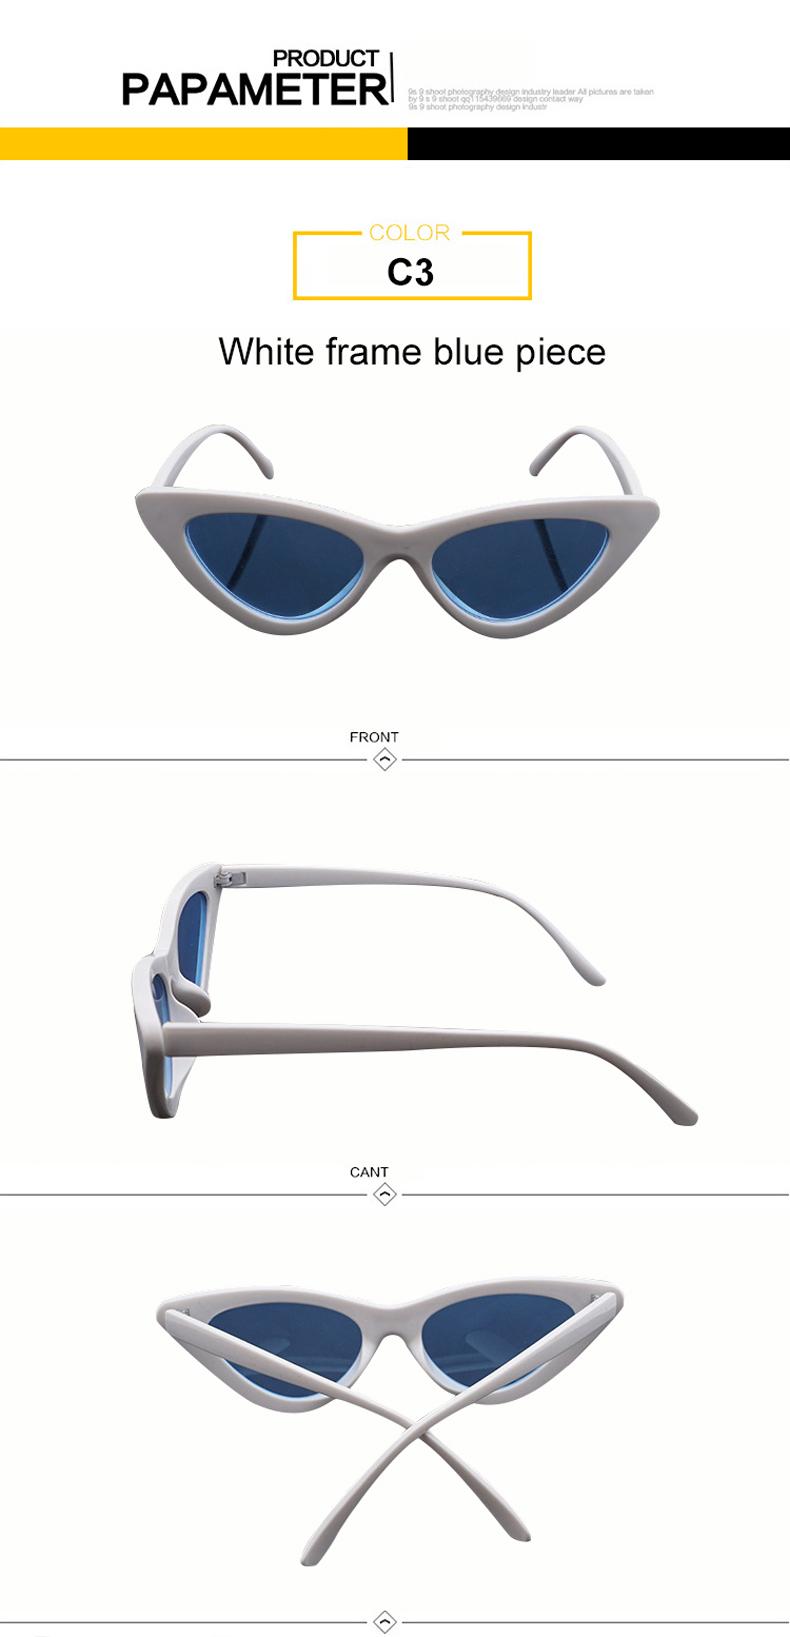 HTB1c81SjzqhSKJjSspnq6A79XXaj - WHO CUTIE 2018 Brand Designer Black Cat Eye Sunglasses Women Cool Small Cateye Frame Sun Glasses Fashion UV400 Shades WG-008